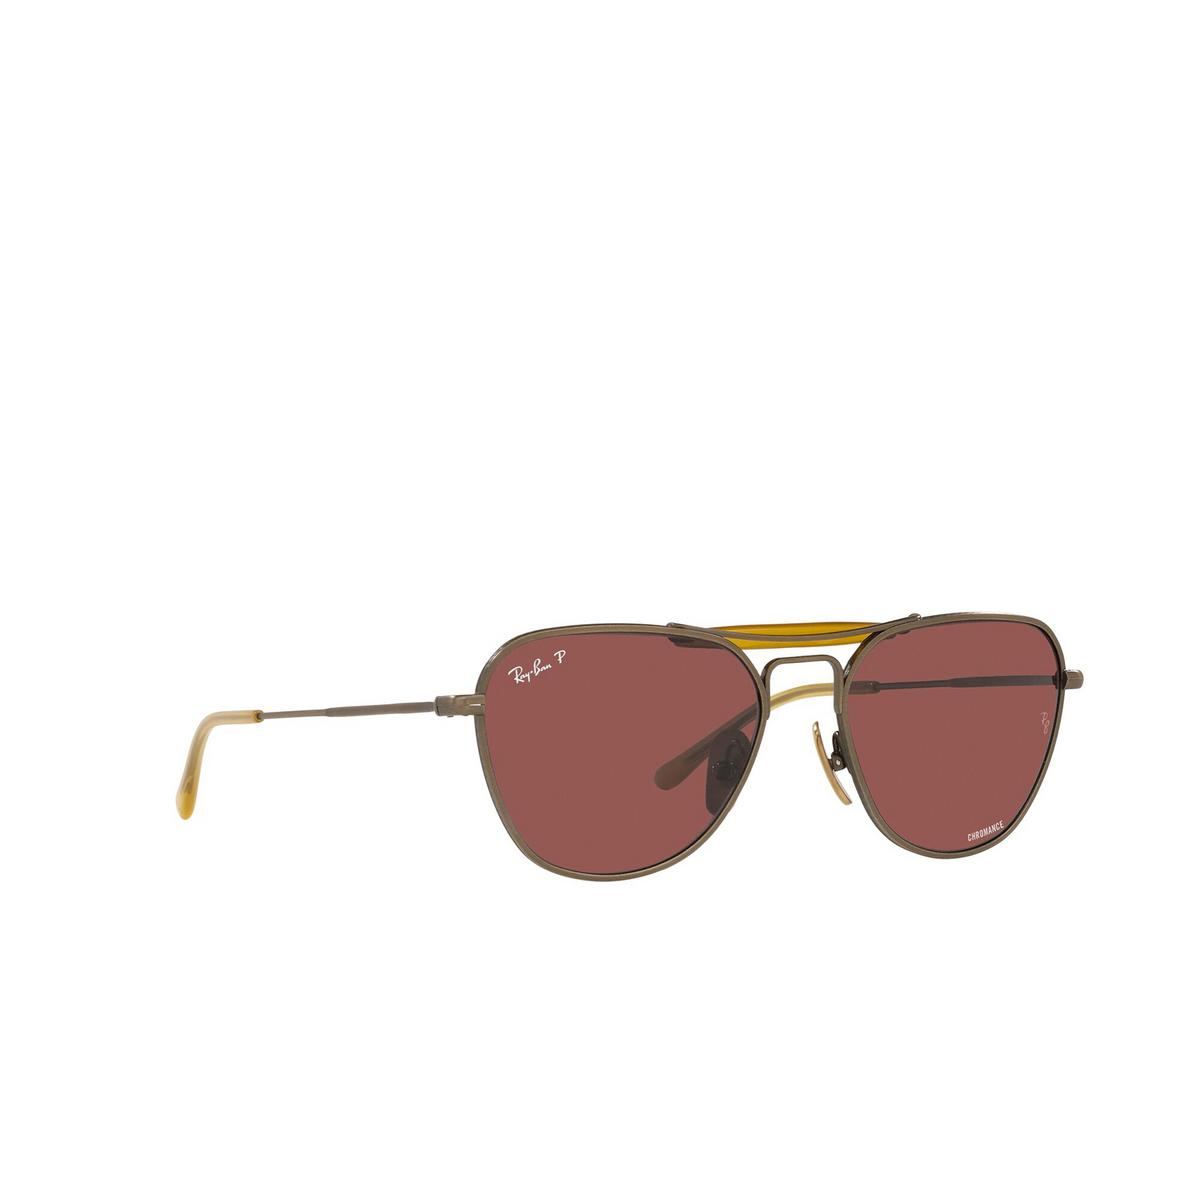 Ray-Ban® Irregular Sunglasses: RB8064 color Demi Gloss Antique Gold 9207AL - three-quarters view.